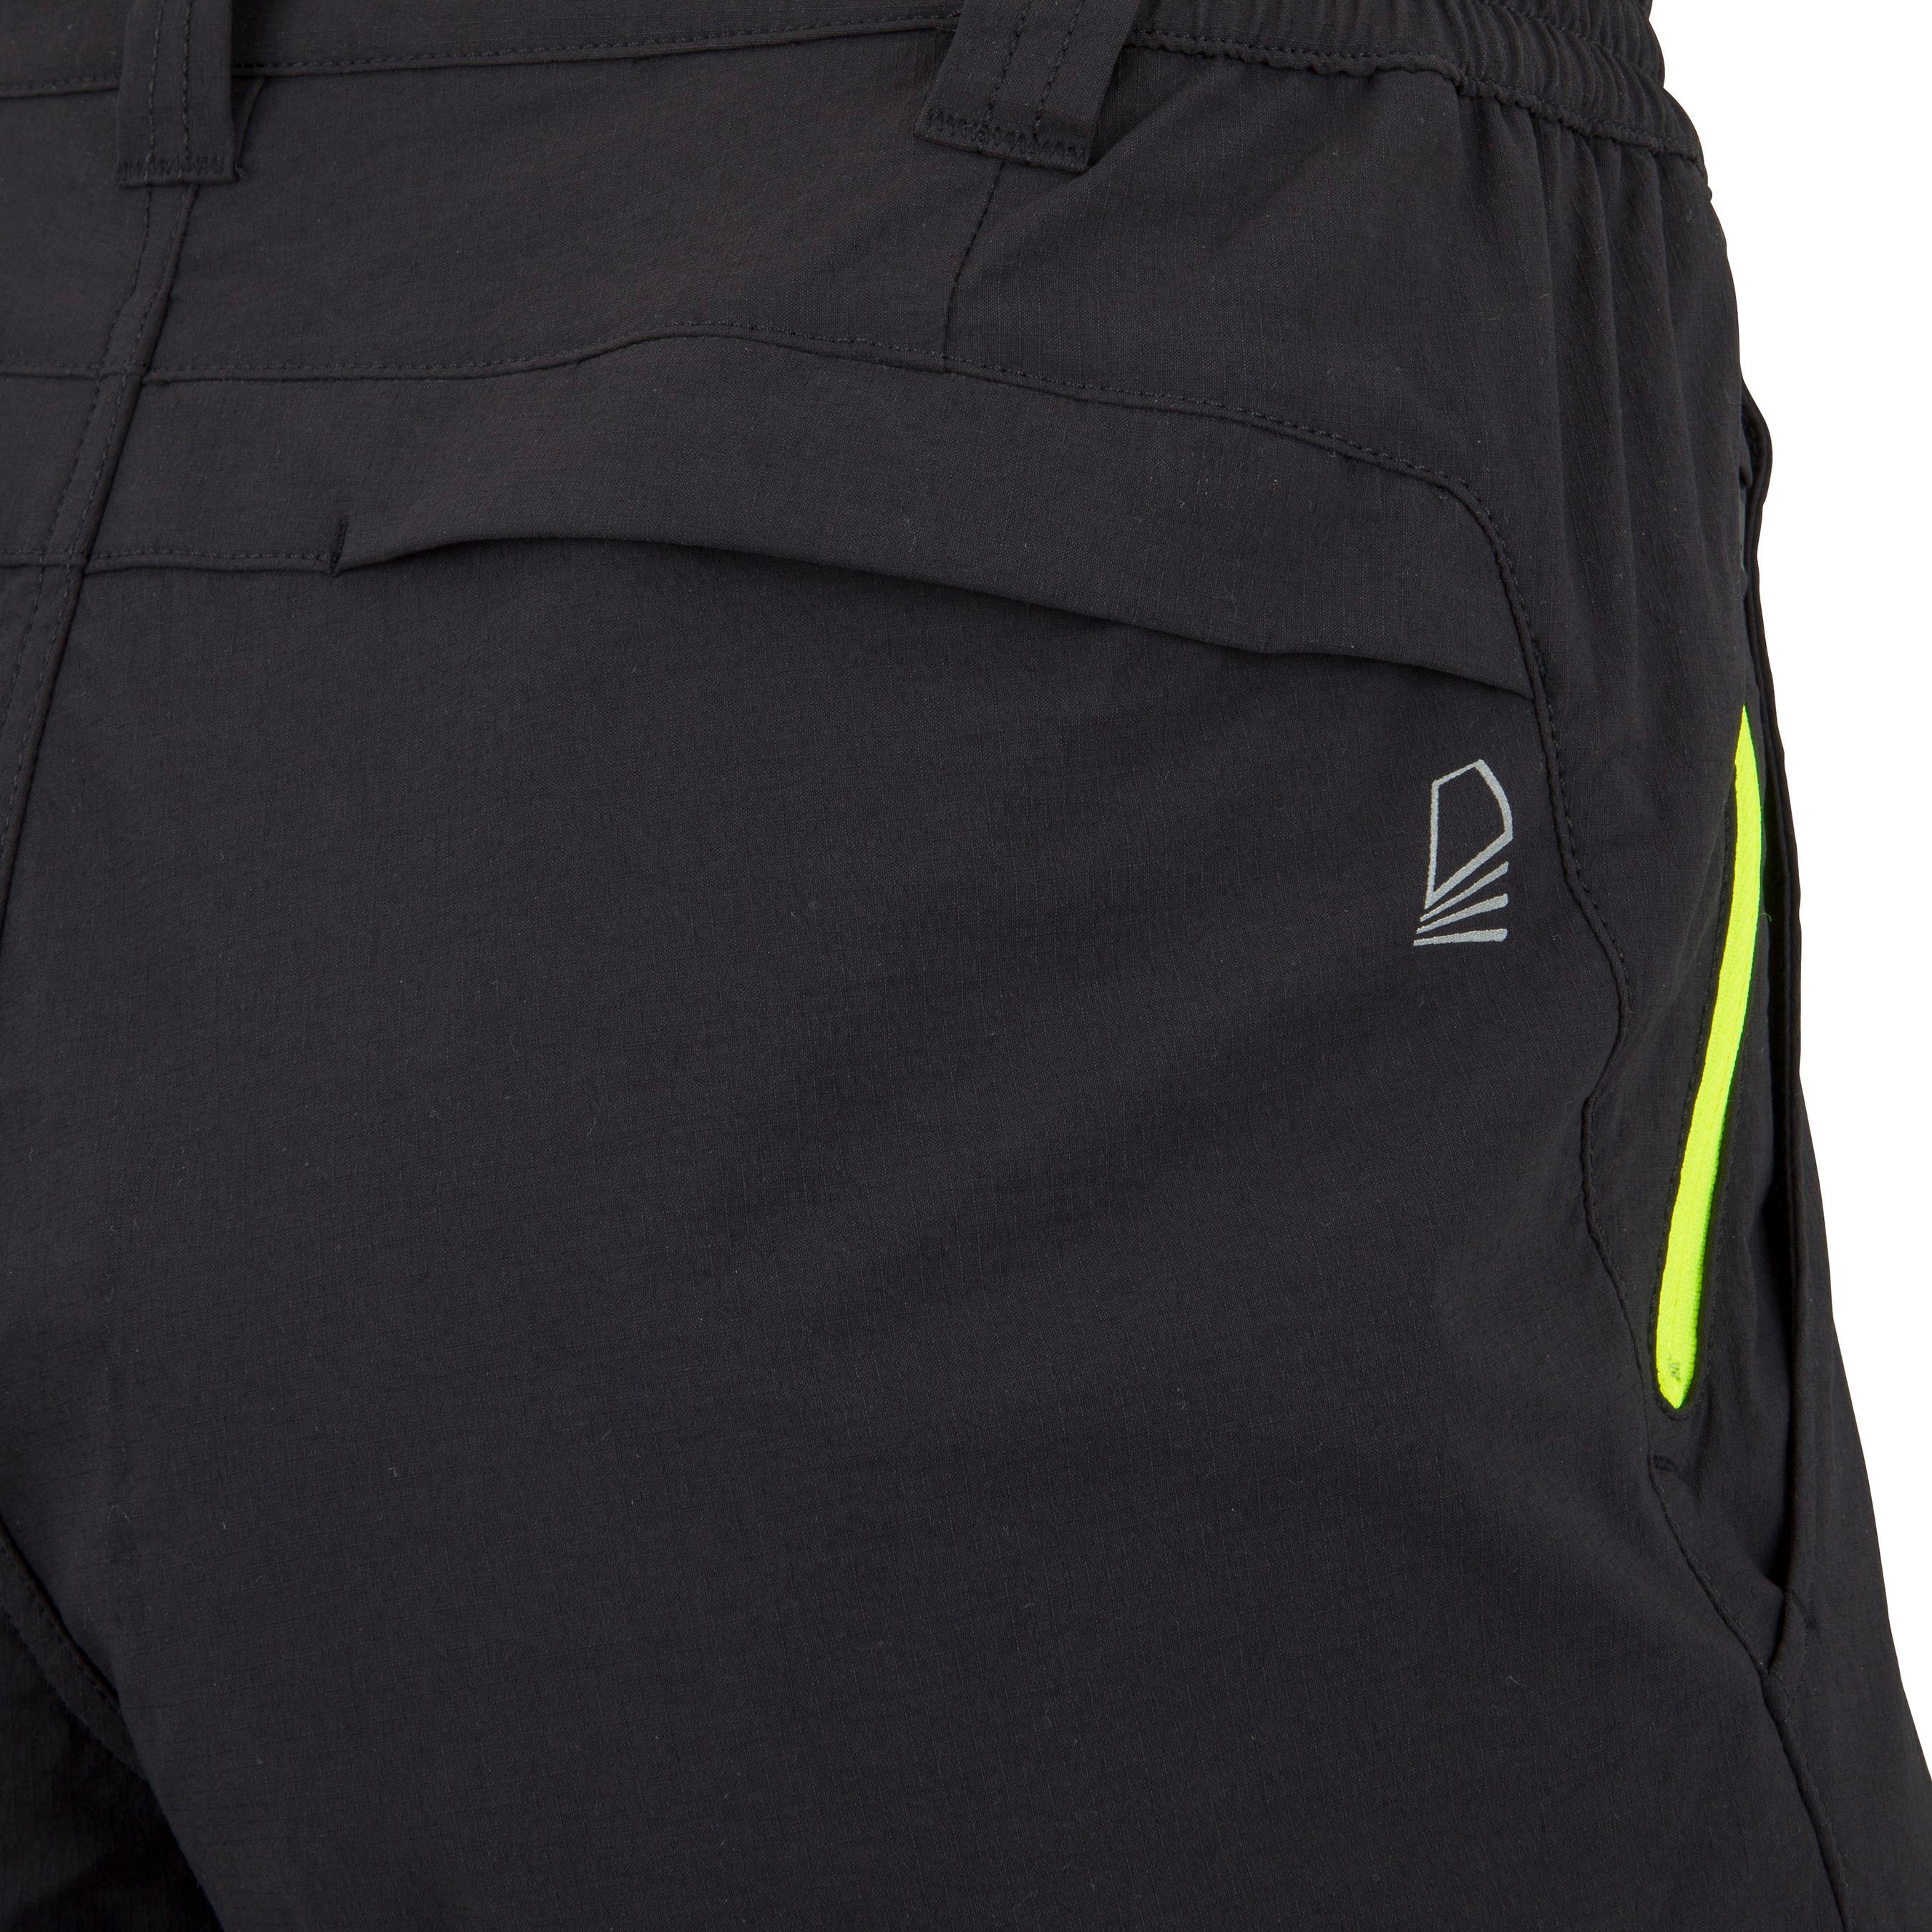 Bermuda shorts for regattas Race men's black